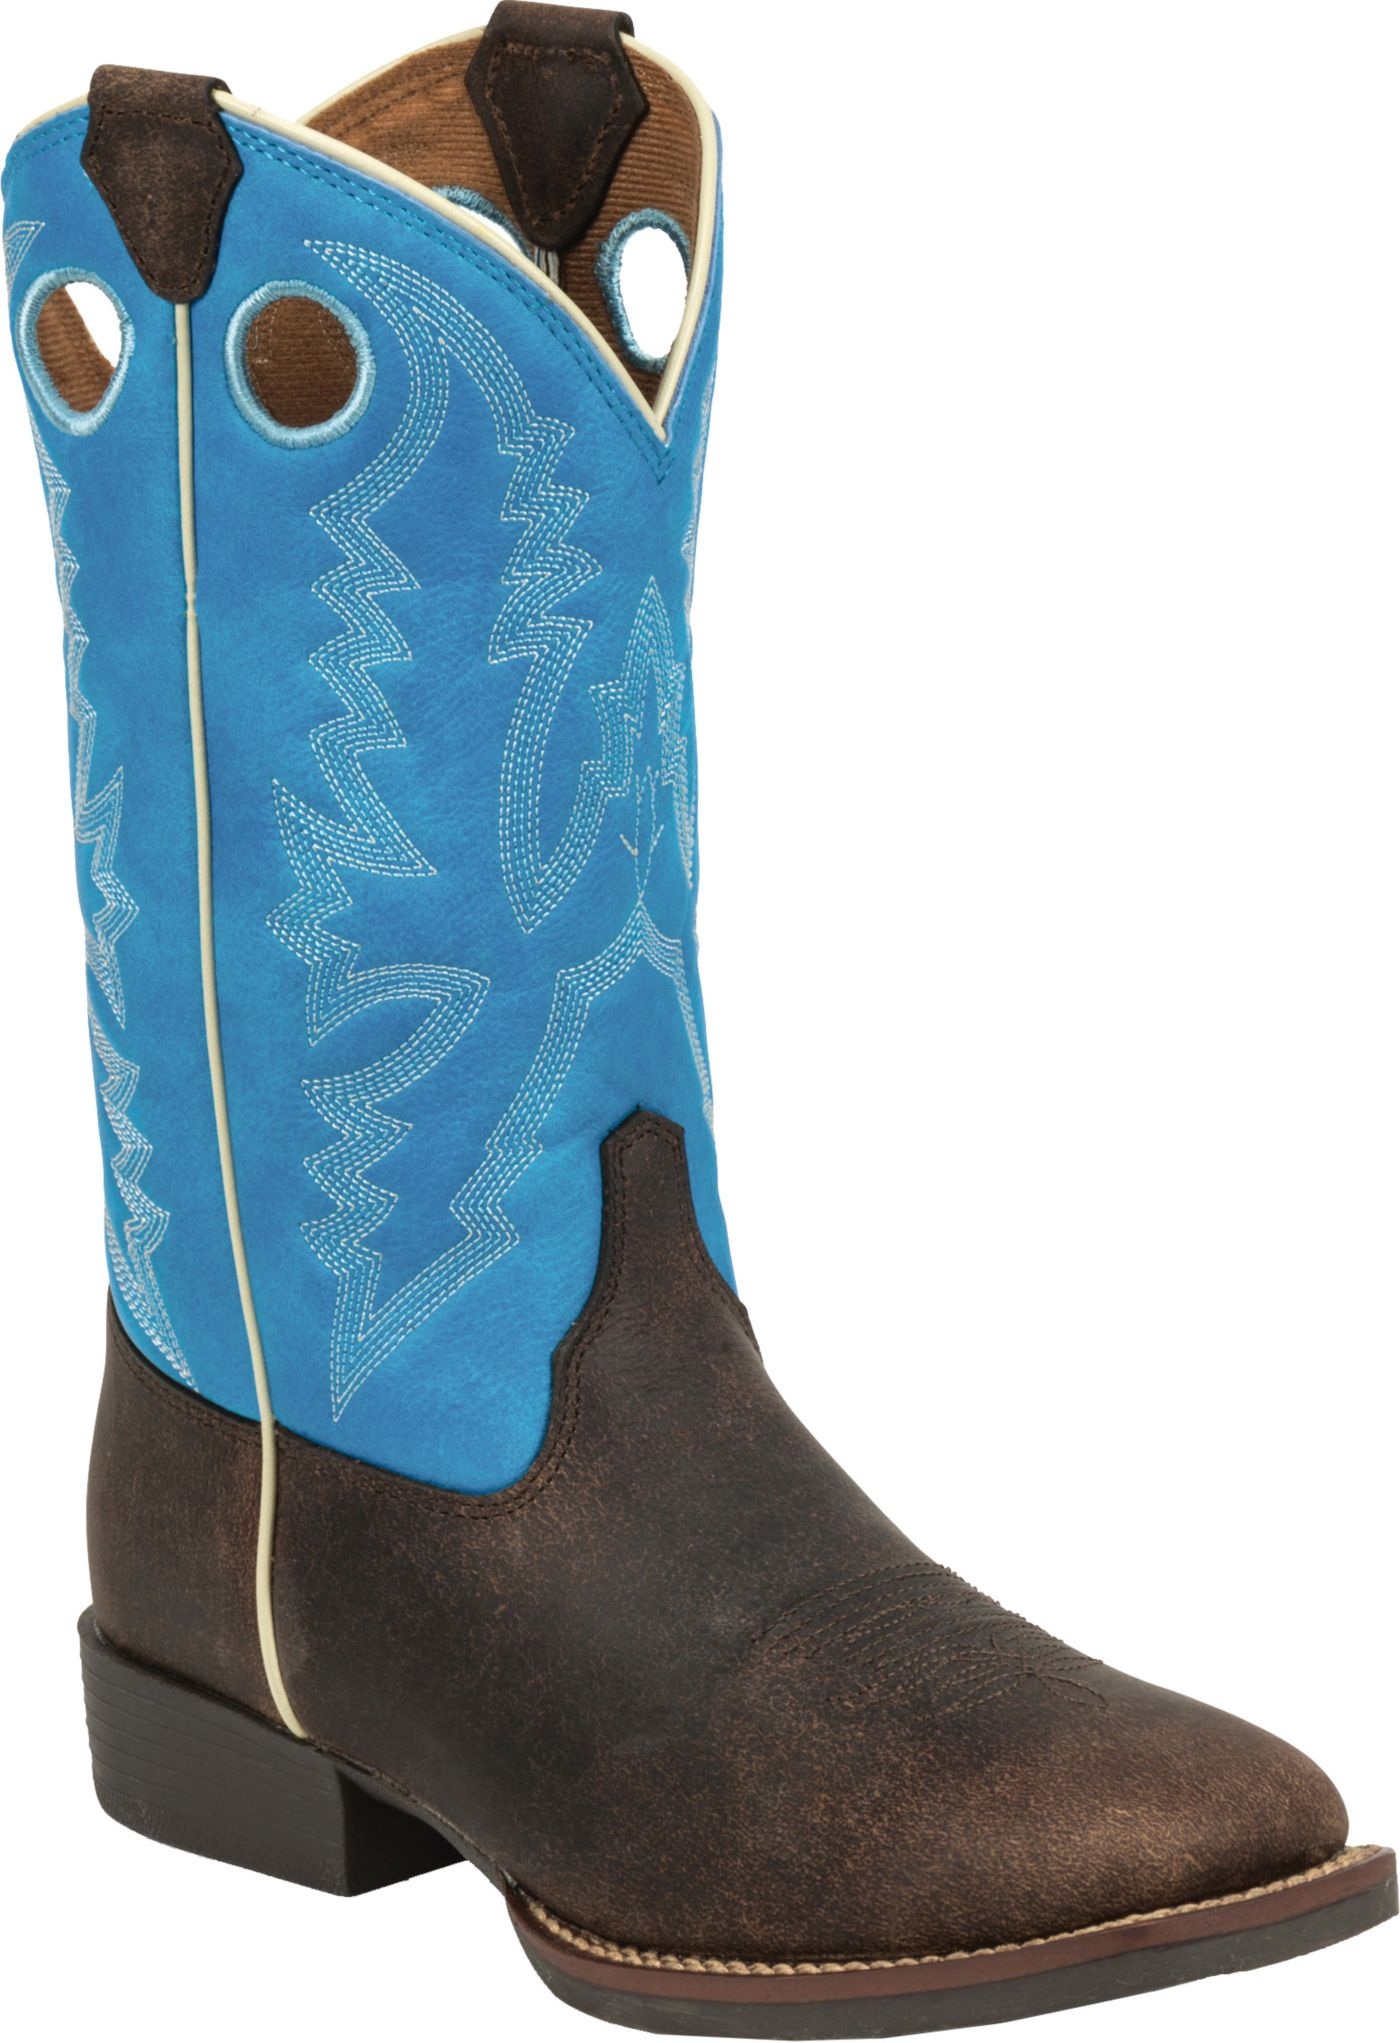 Justin Kids' Chocolate Brown Buffalo Bent Rail Western Boots